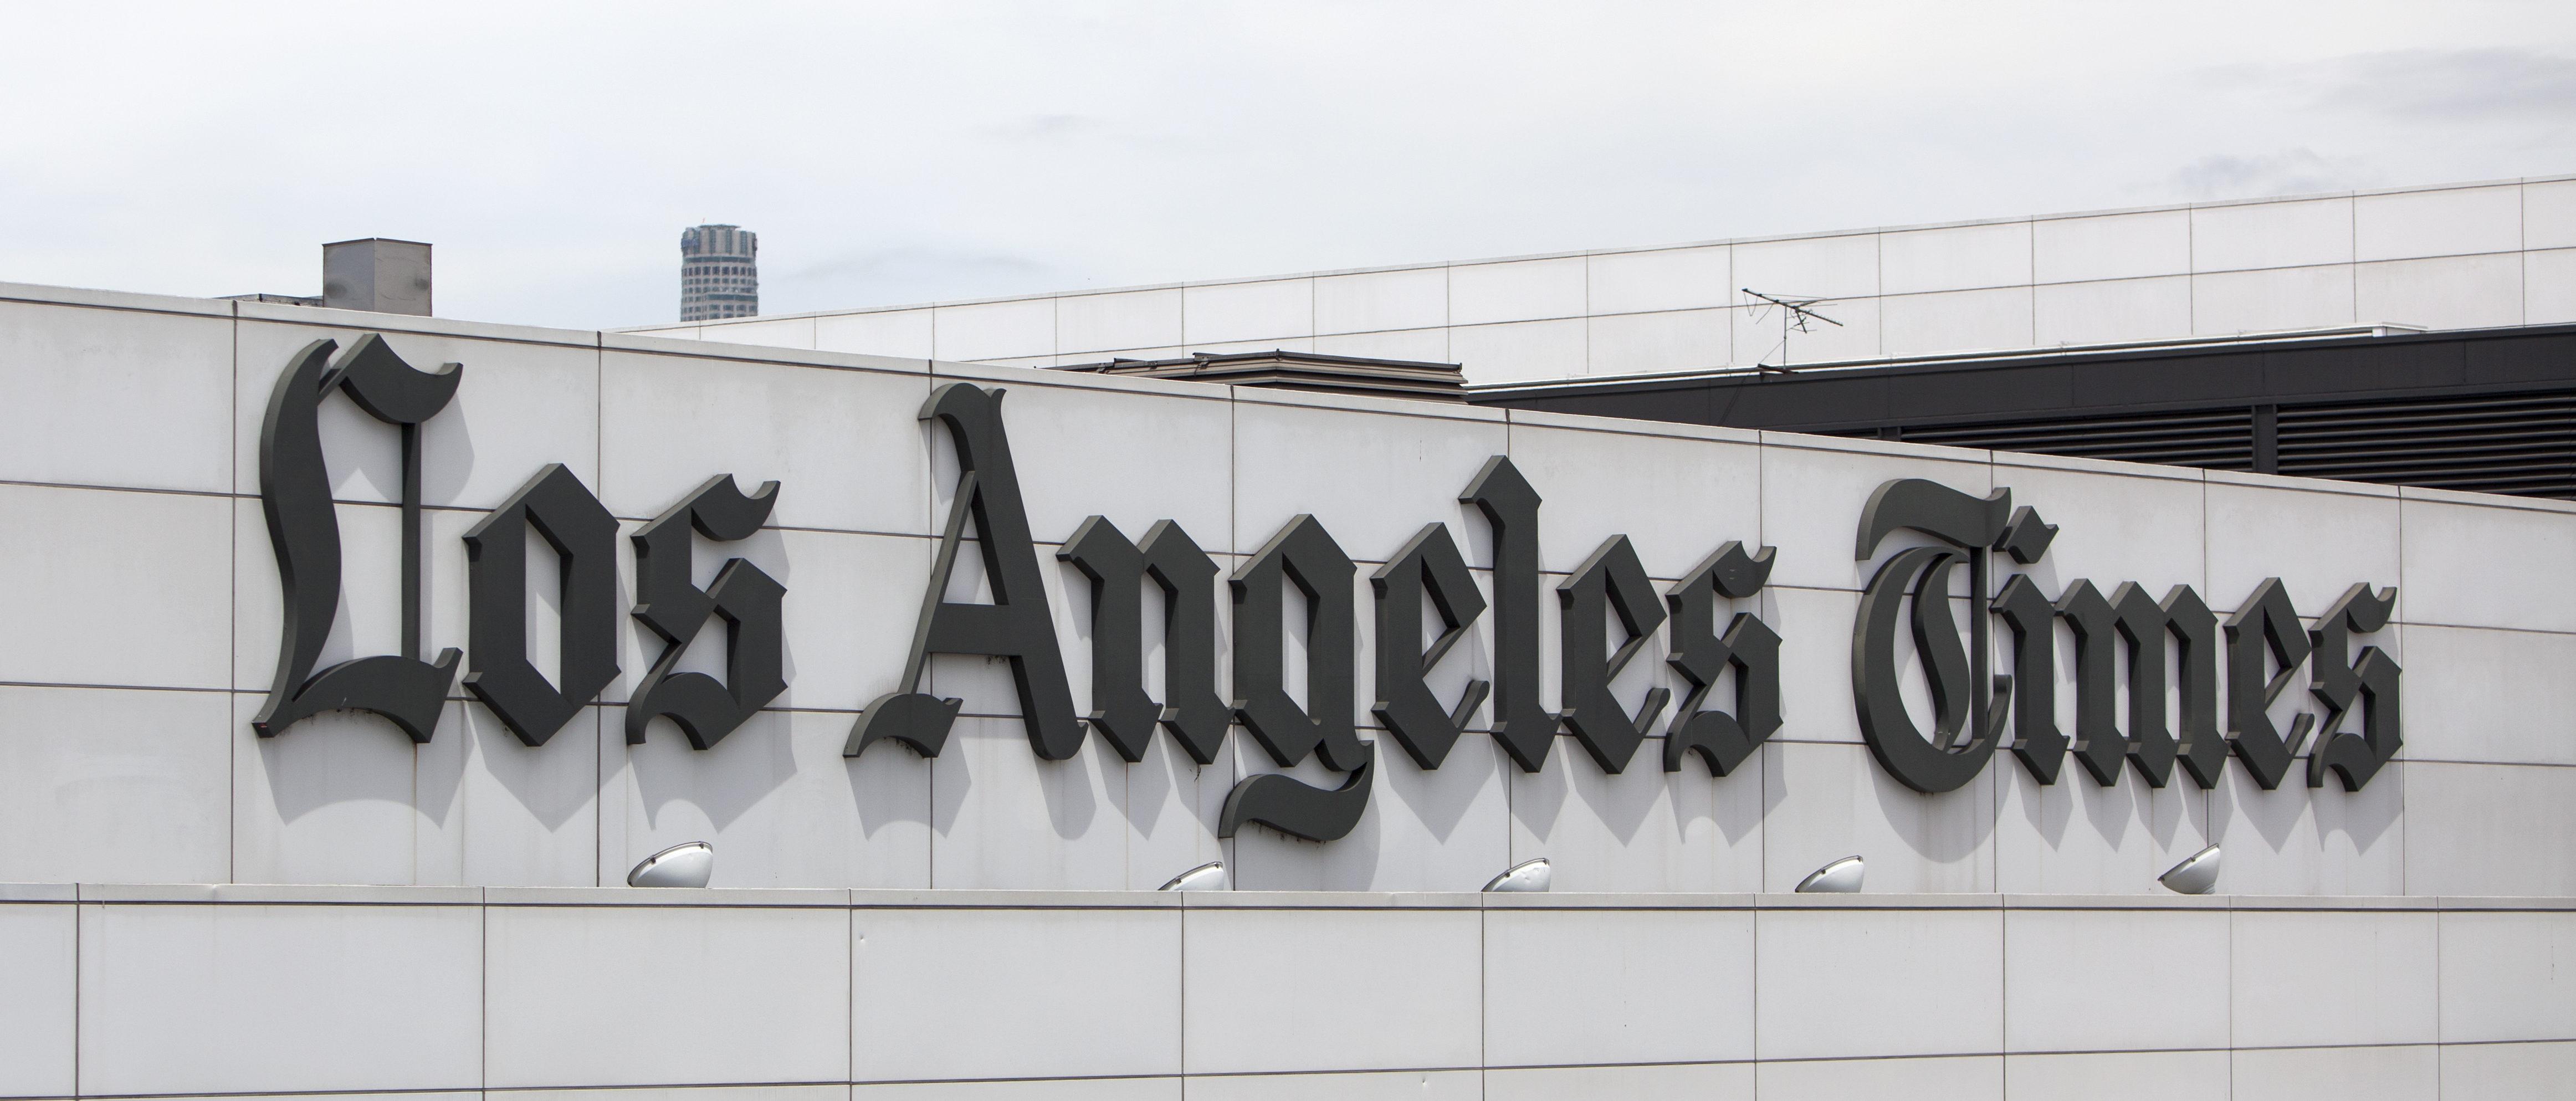 LA Time editor helped his girlfriend get an abortion. Juli Hansen, Shutterstock